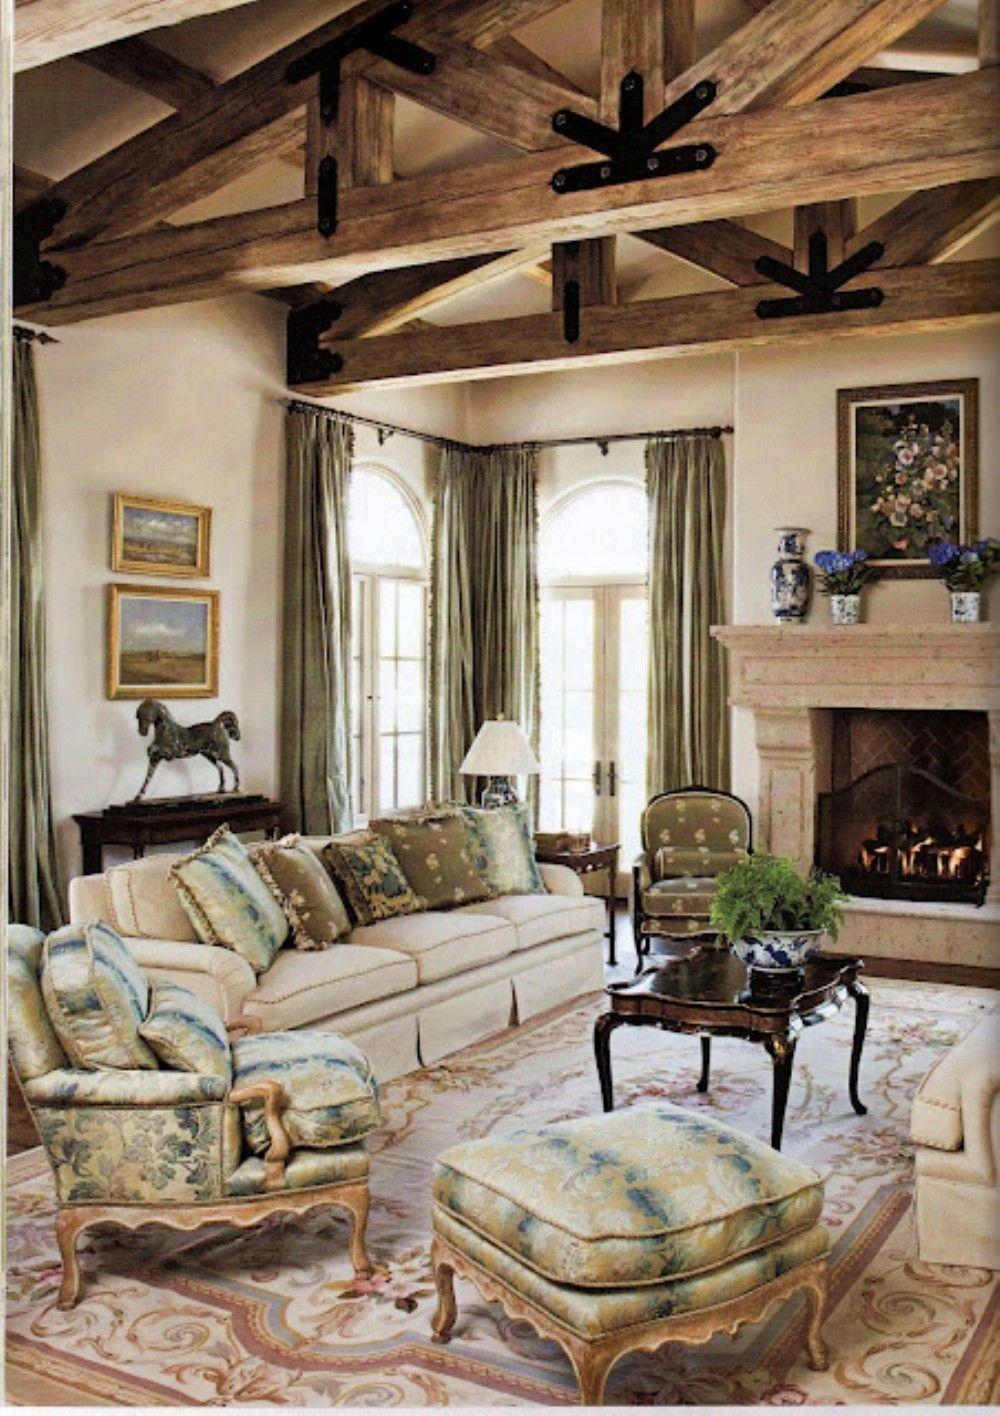 Country living room design ideas - Cool 45 French Country Living Room Design Ideas Https Cooarchitecture Com